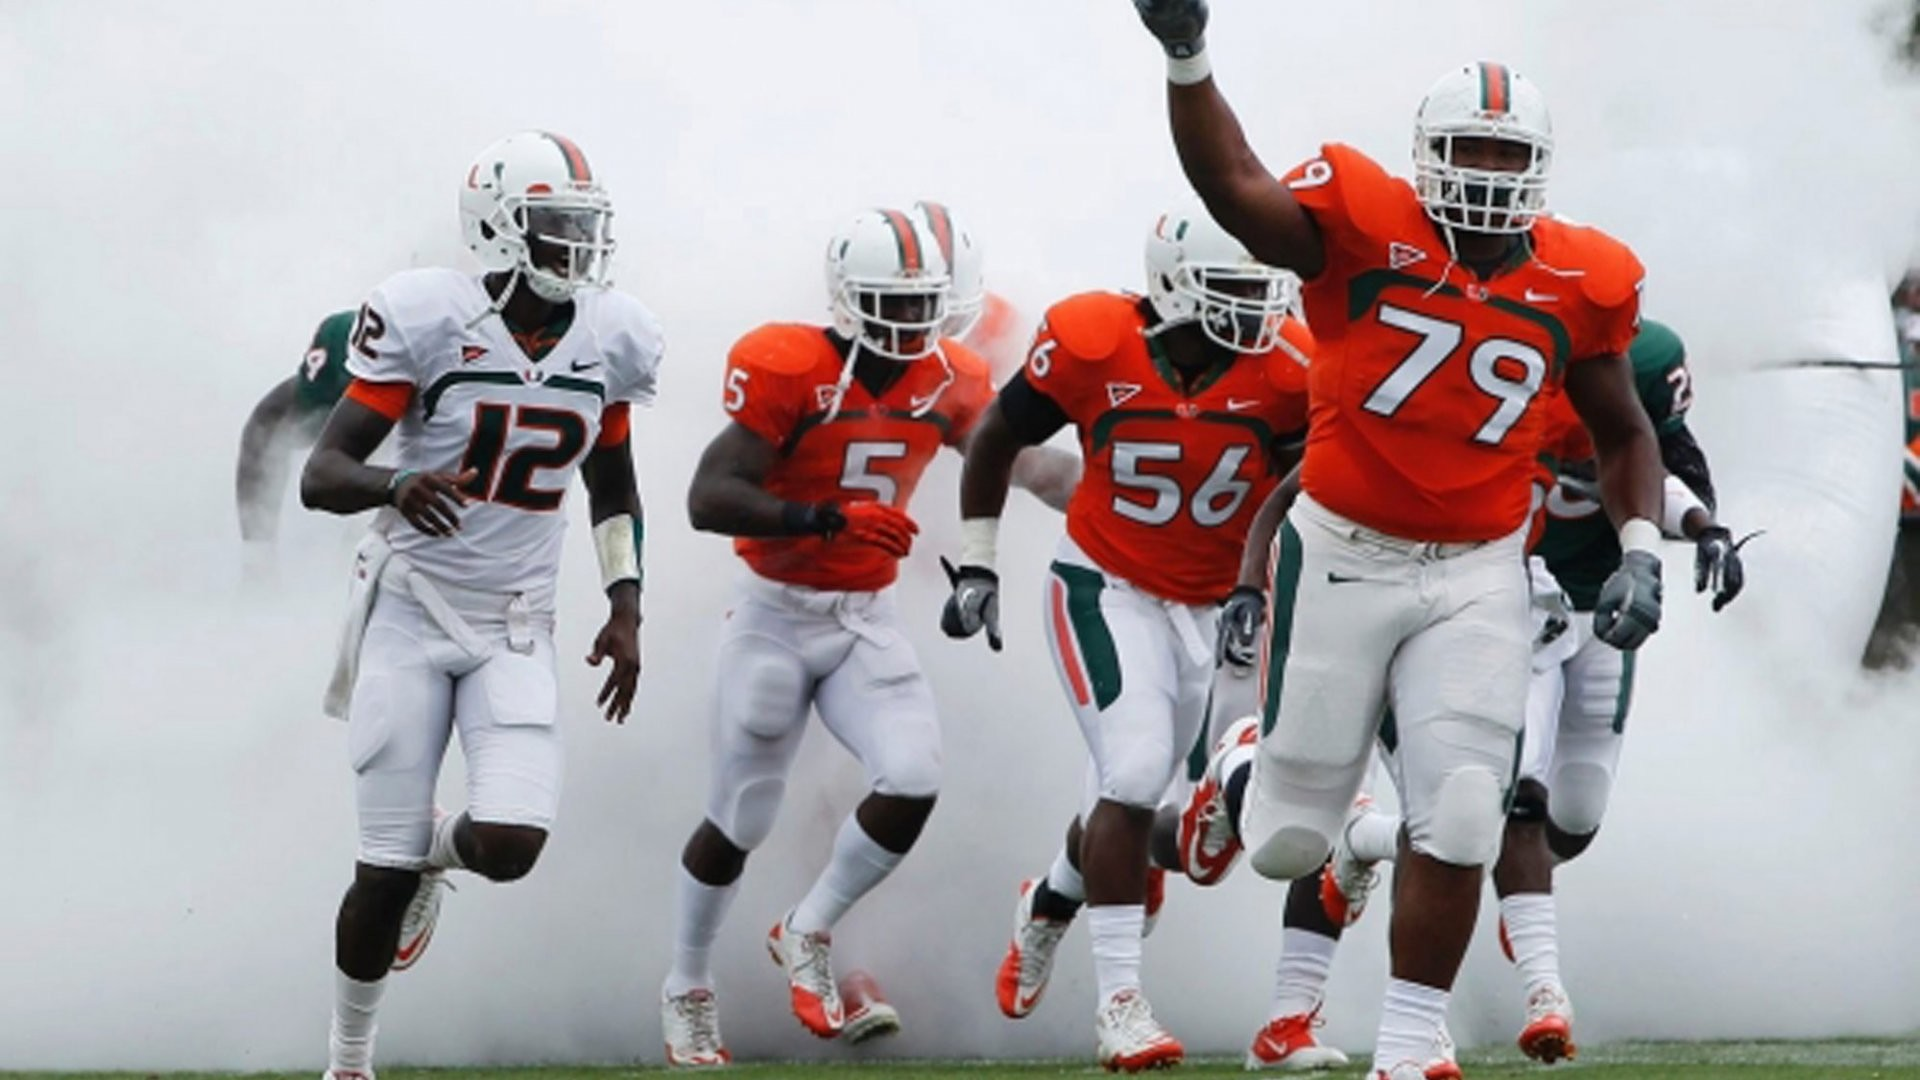 Miami hurricanes football photo gallery Miami Football - Hurricanes Photos - ESPN